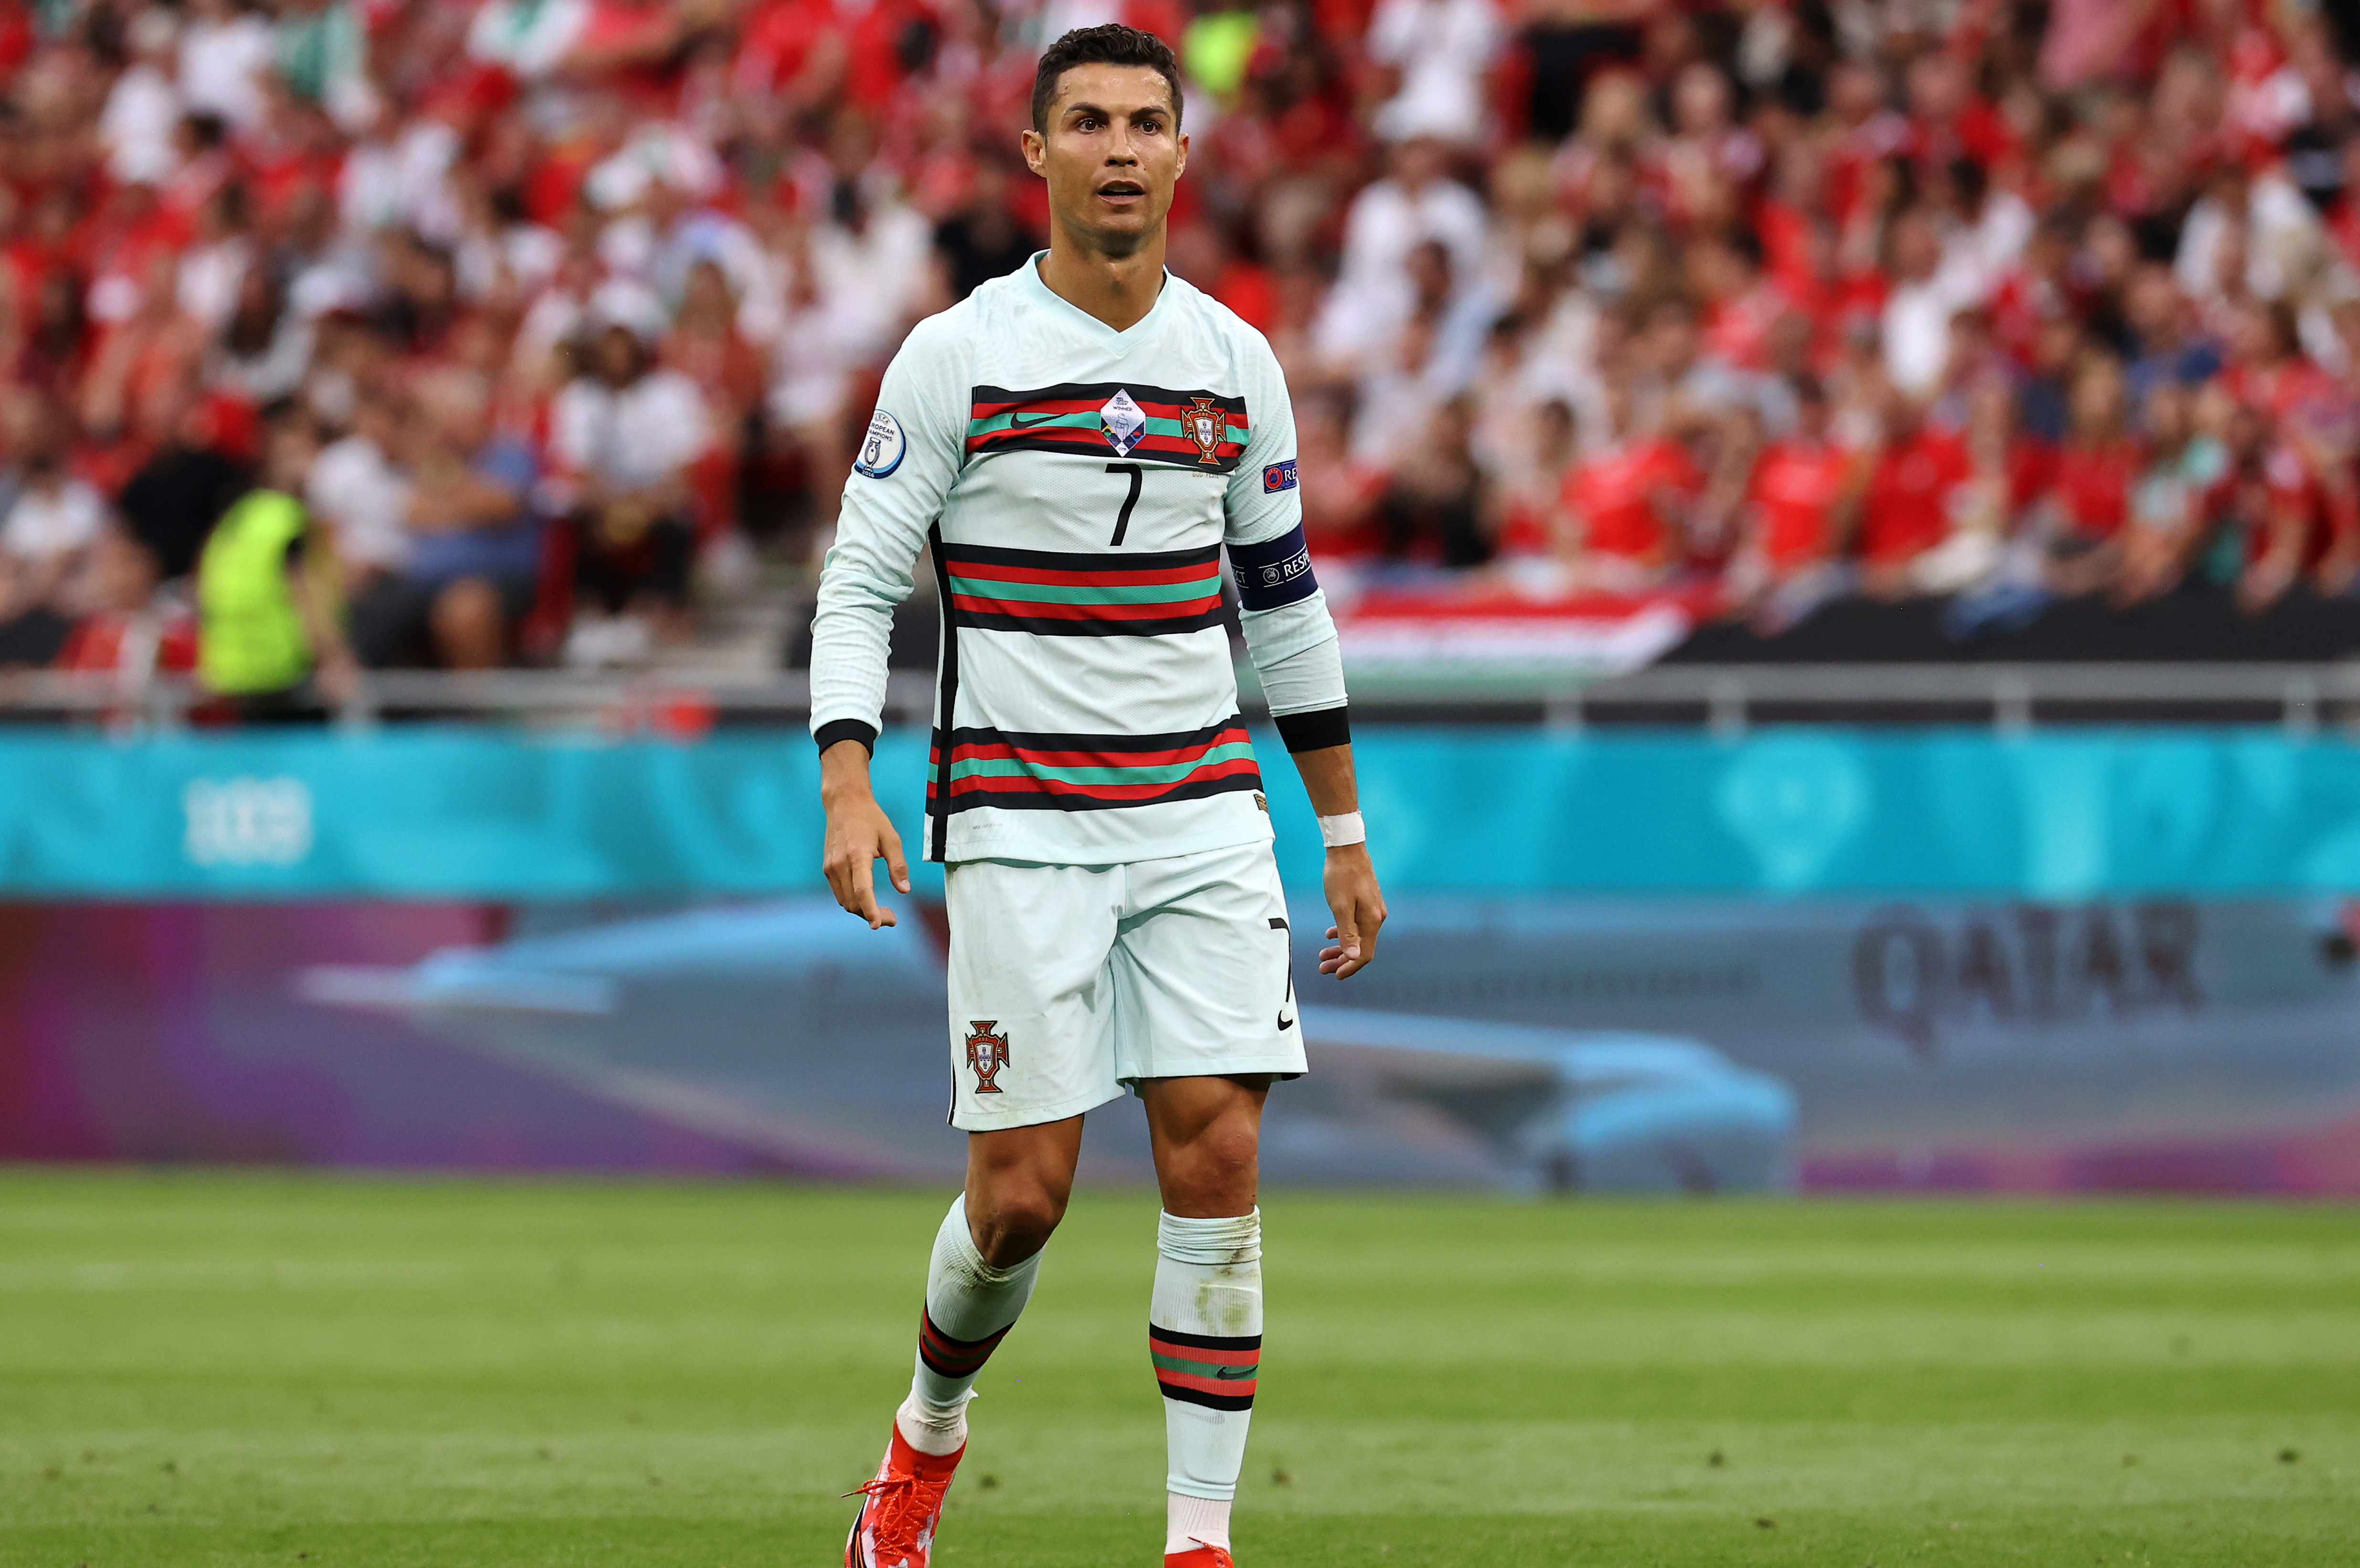 Cristiano Ronaldo Sets Euros All-Time Scoring Record with Goal vs. Hungary